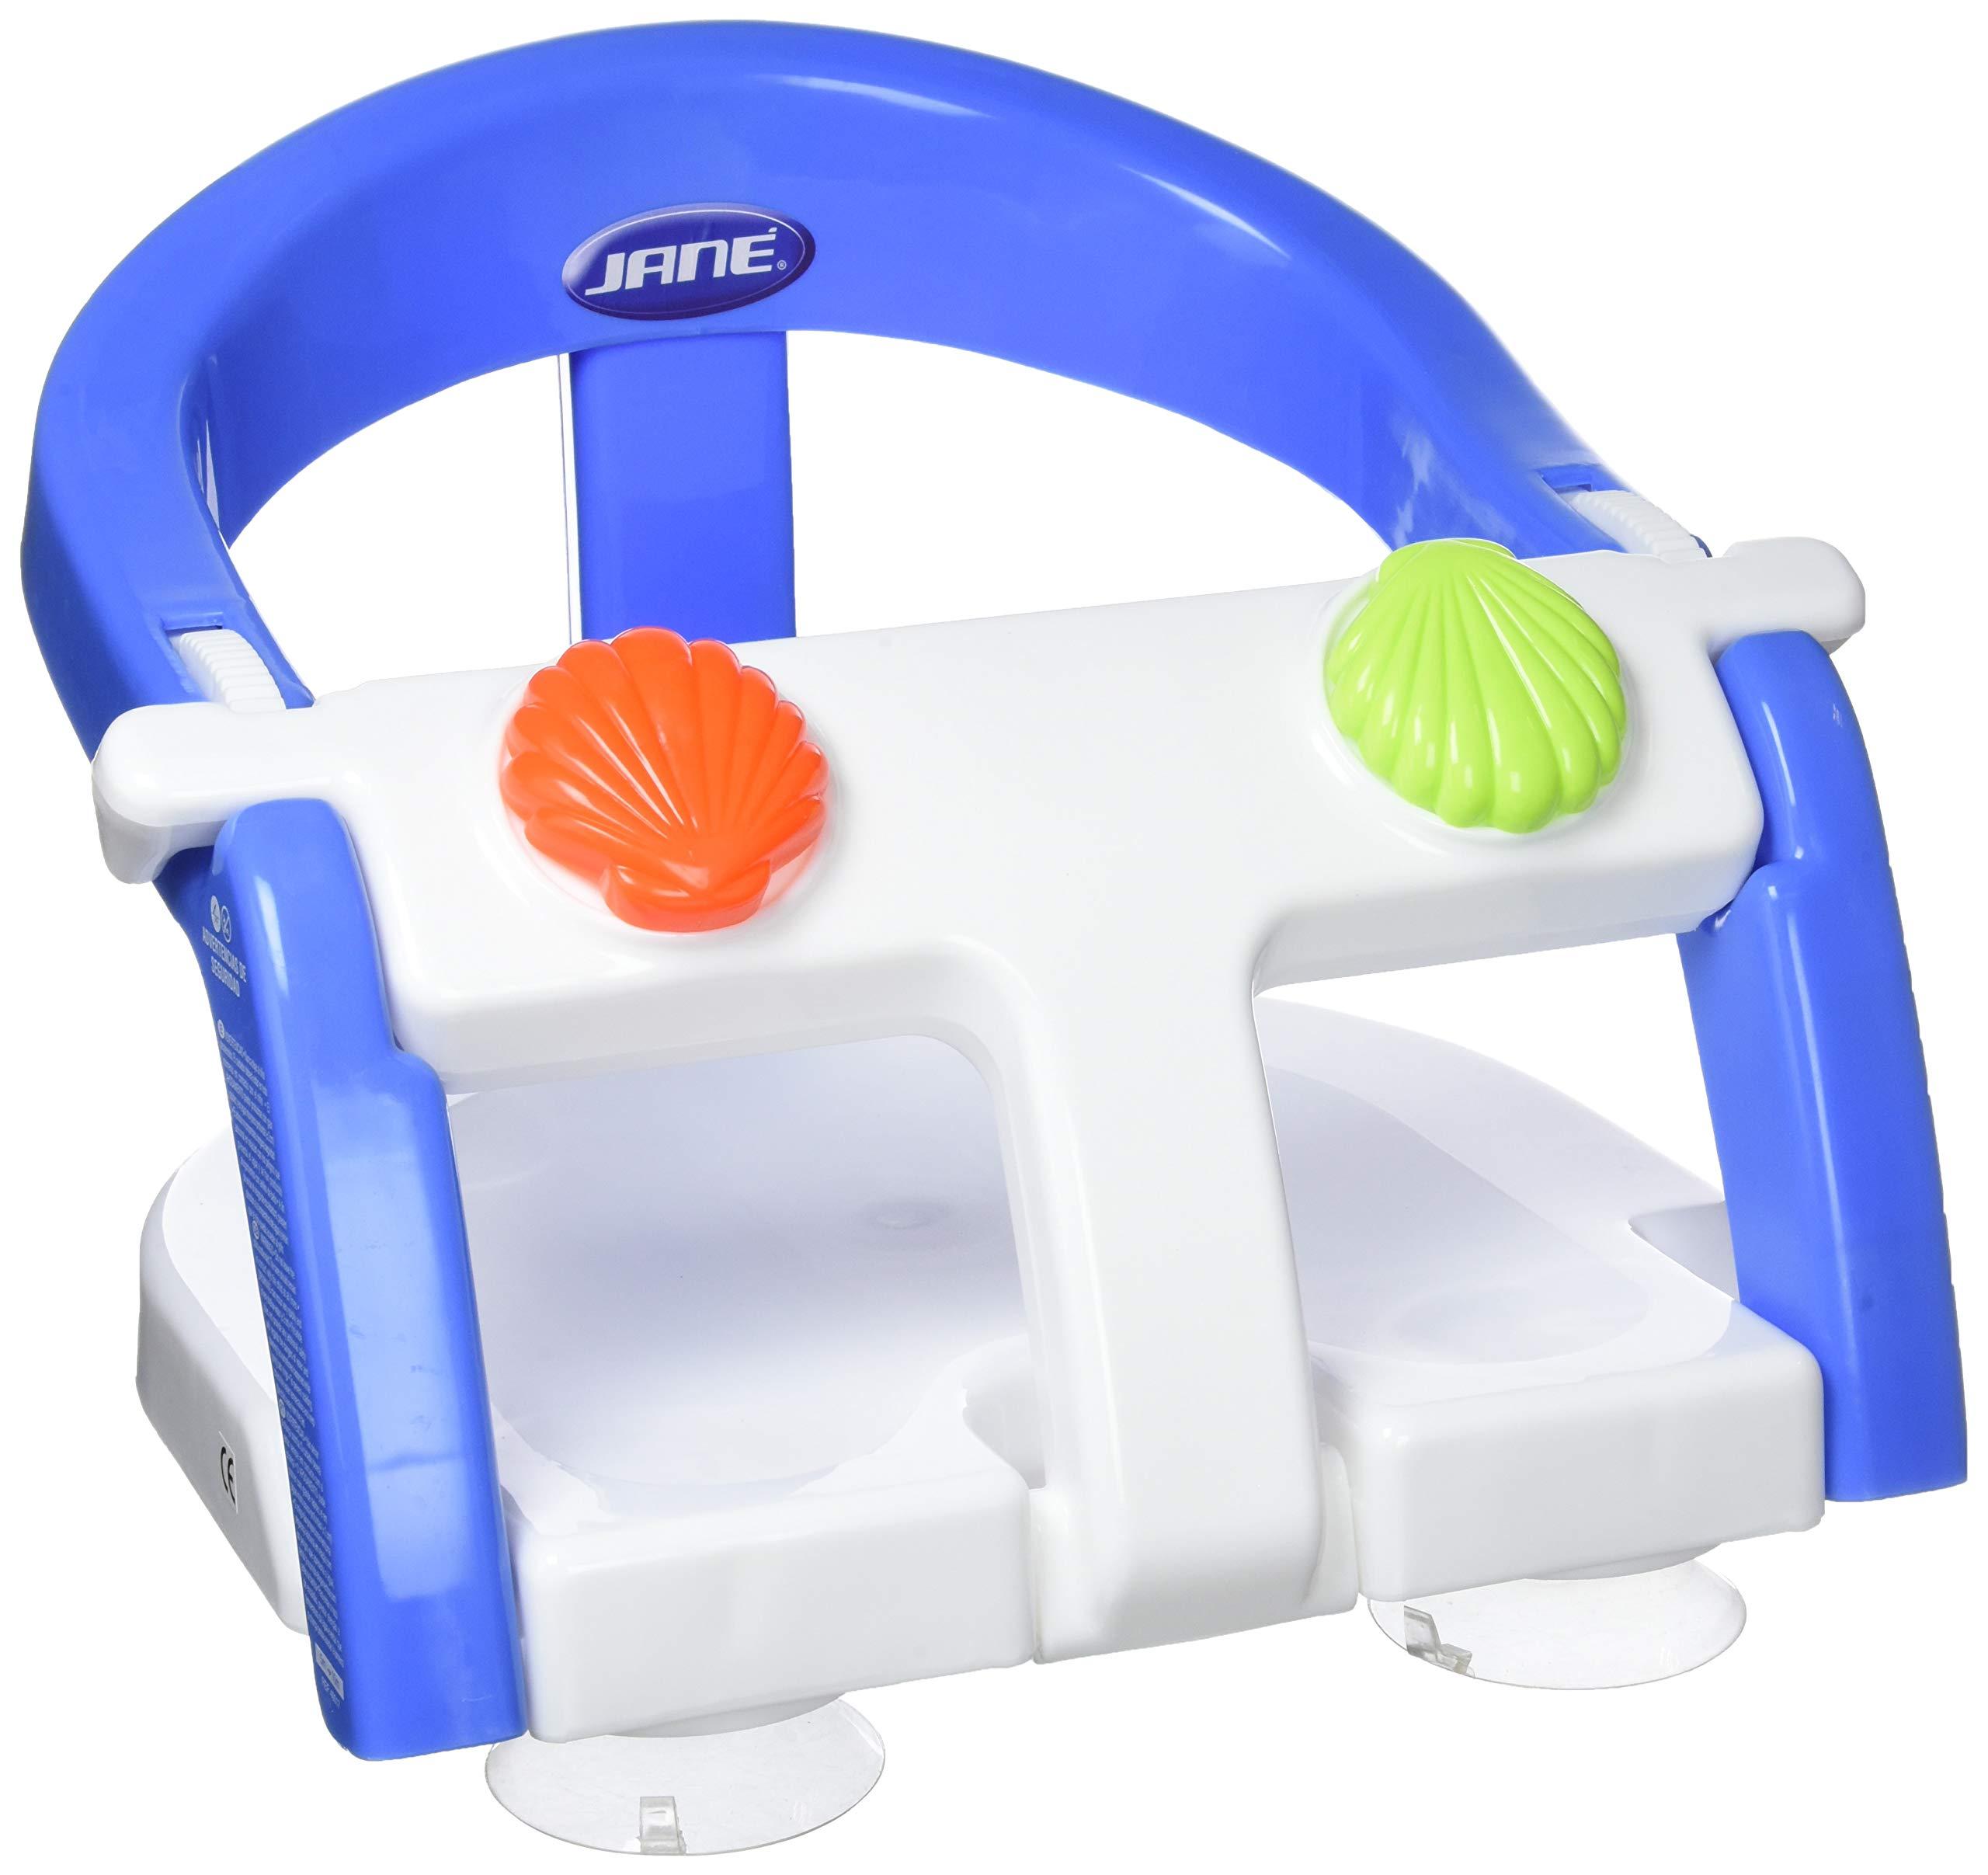 Jane Fluid Bath Ring Seat (Blue)